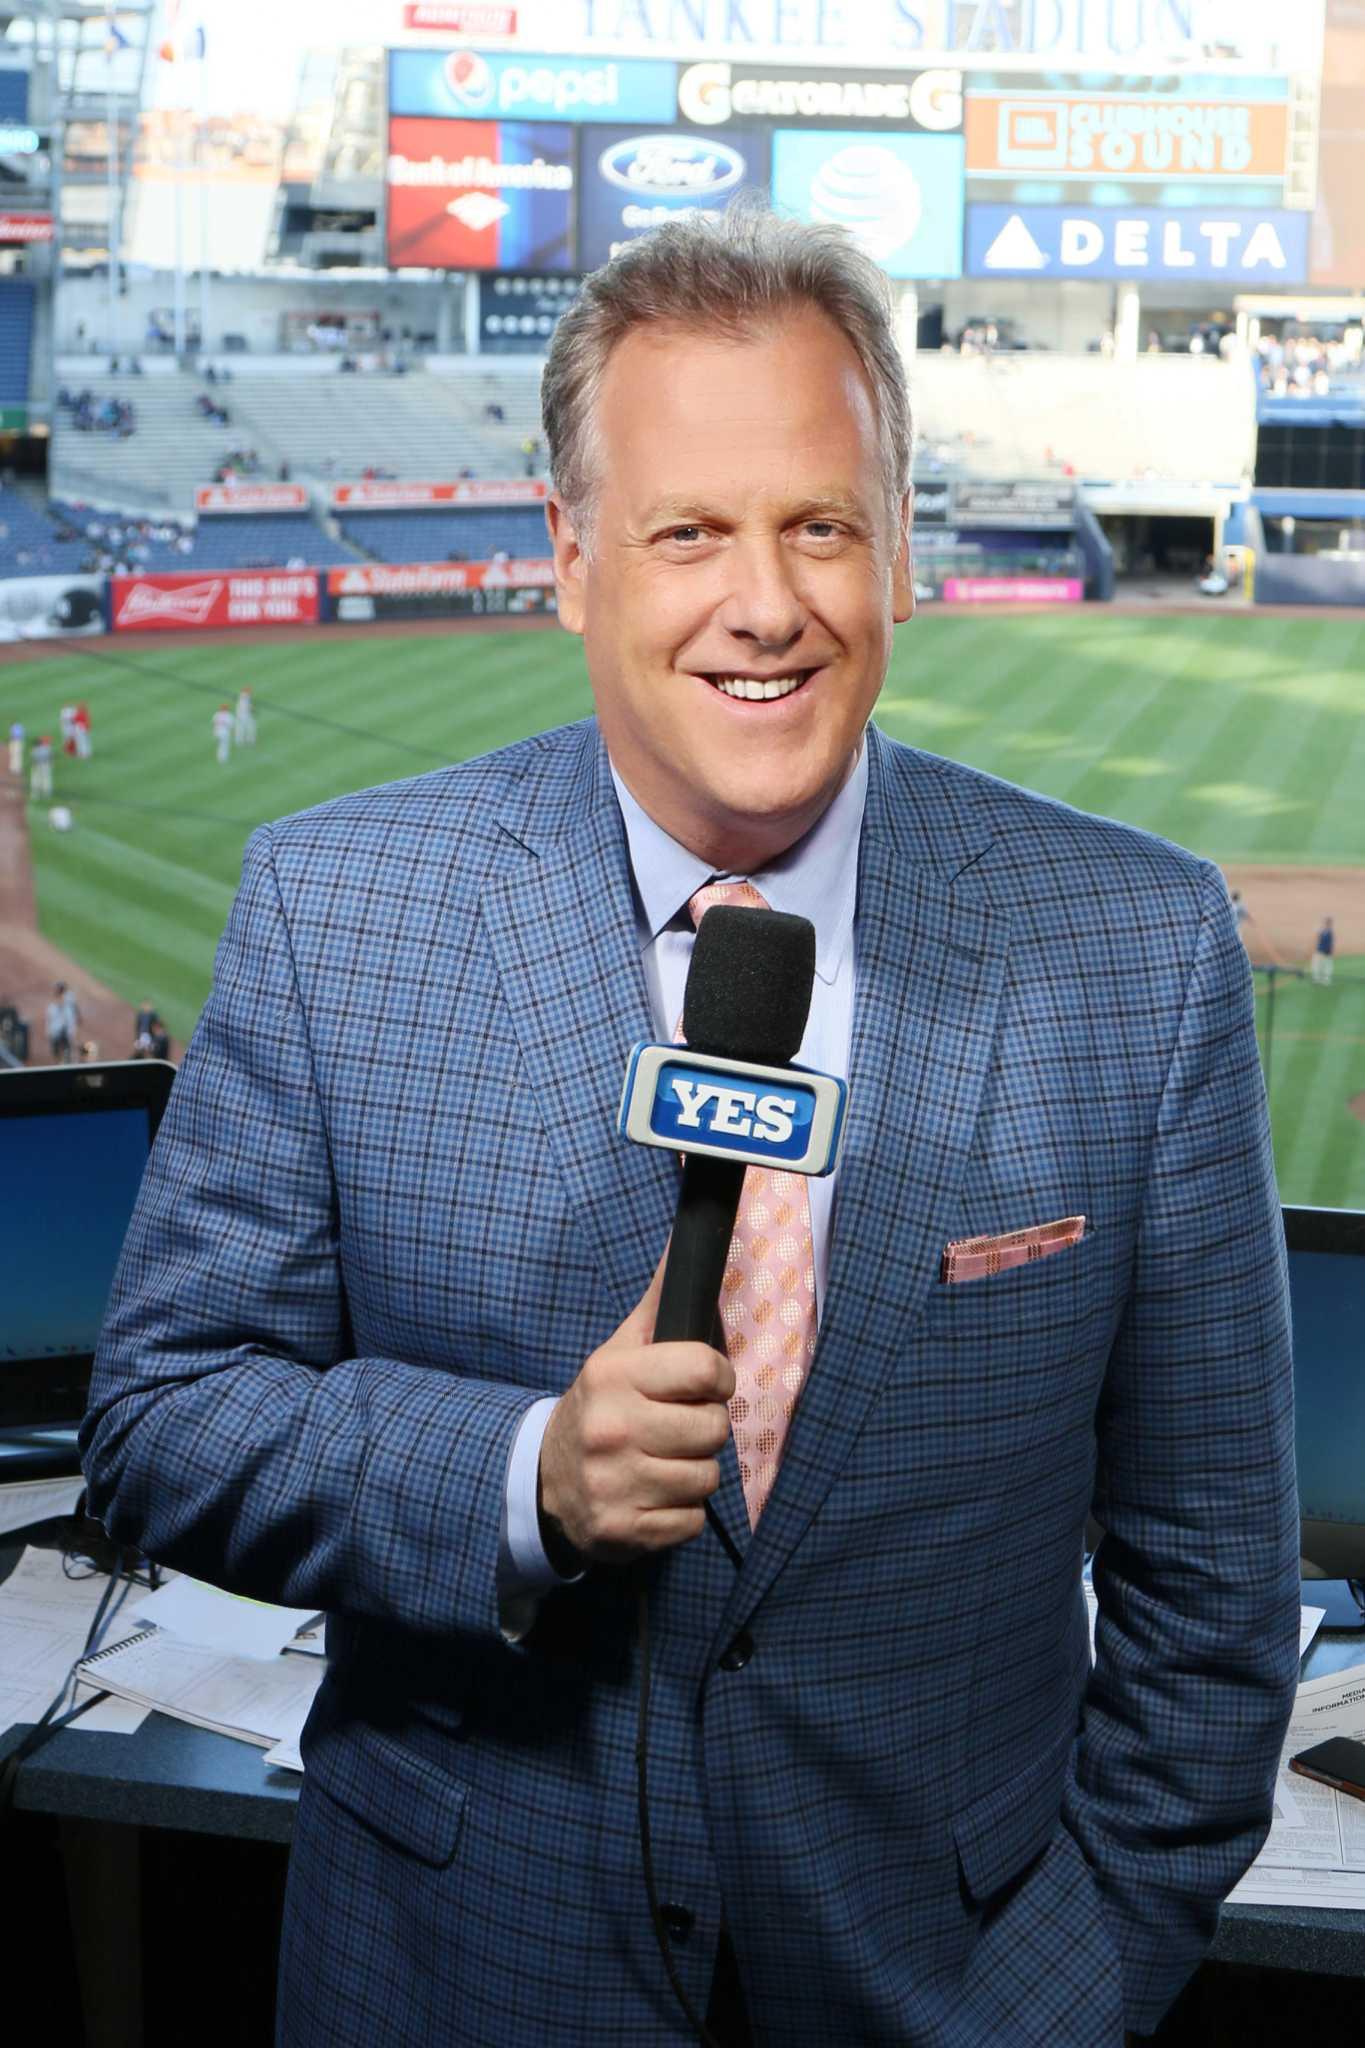 Sportsmedia column: Michael Kay braces for new world of MLB broadcasting